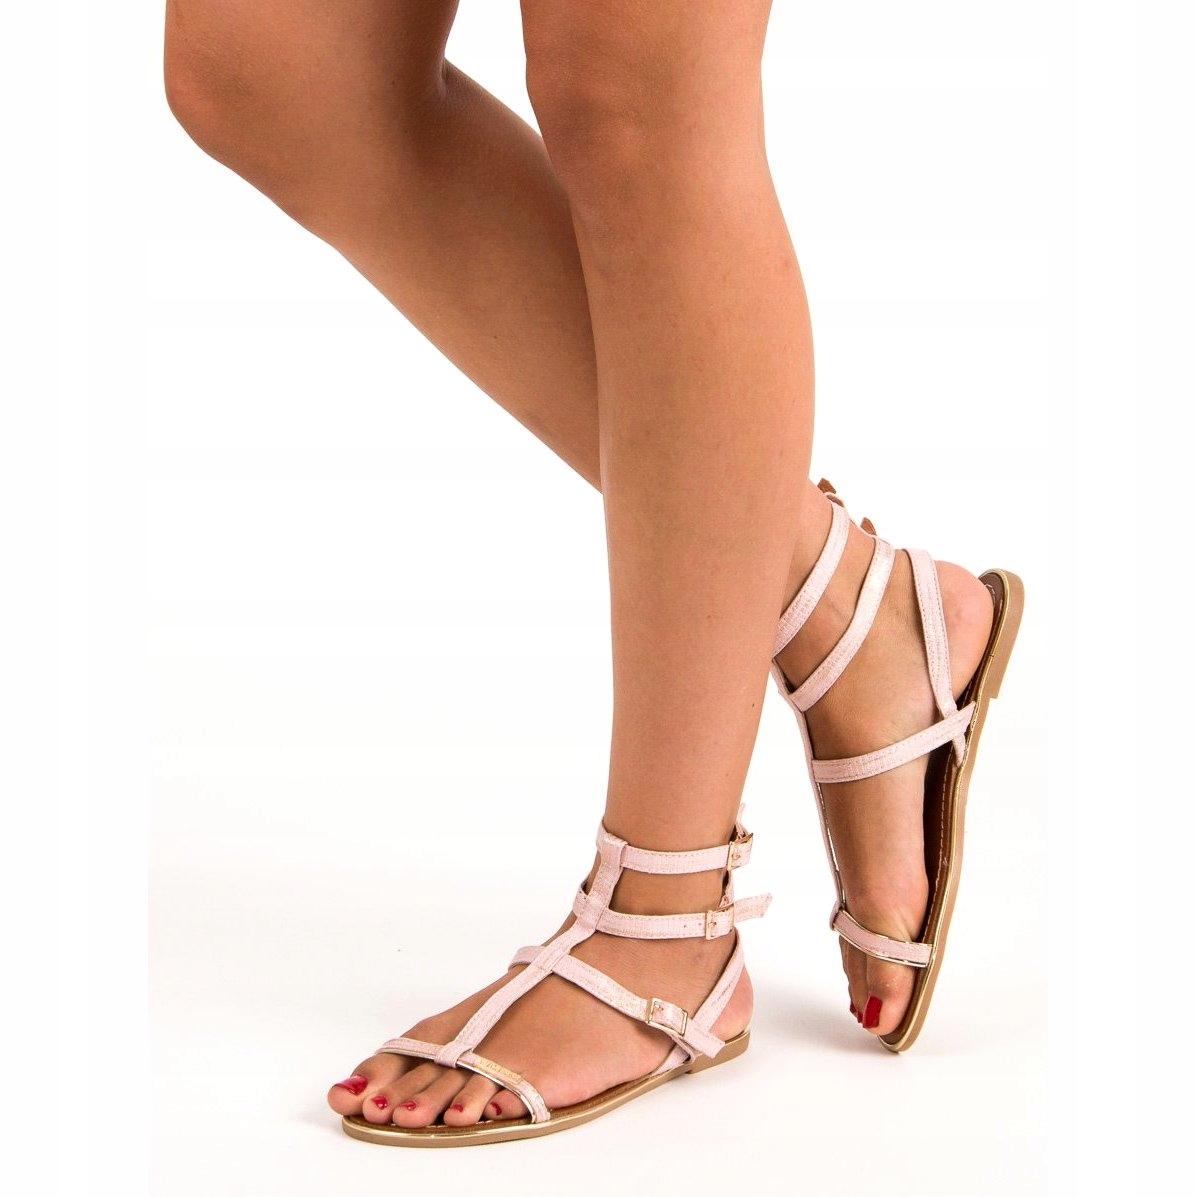 Sandały Damskie na Lato Pudrowe Gumowe Paski R. 36